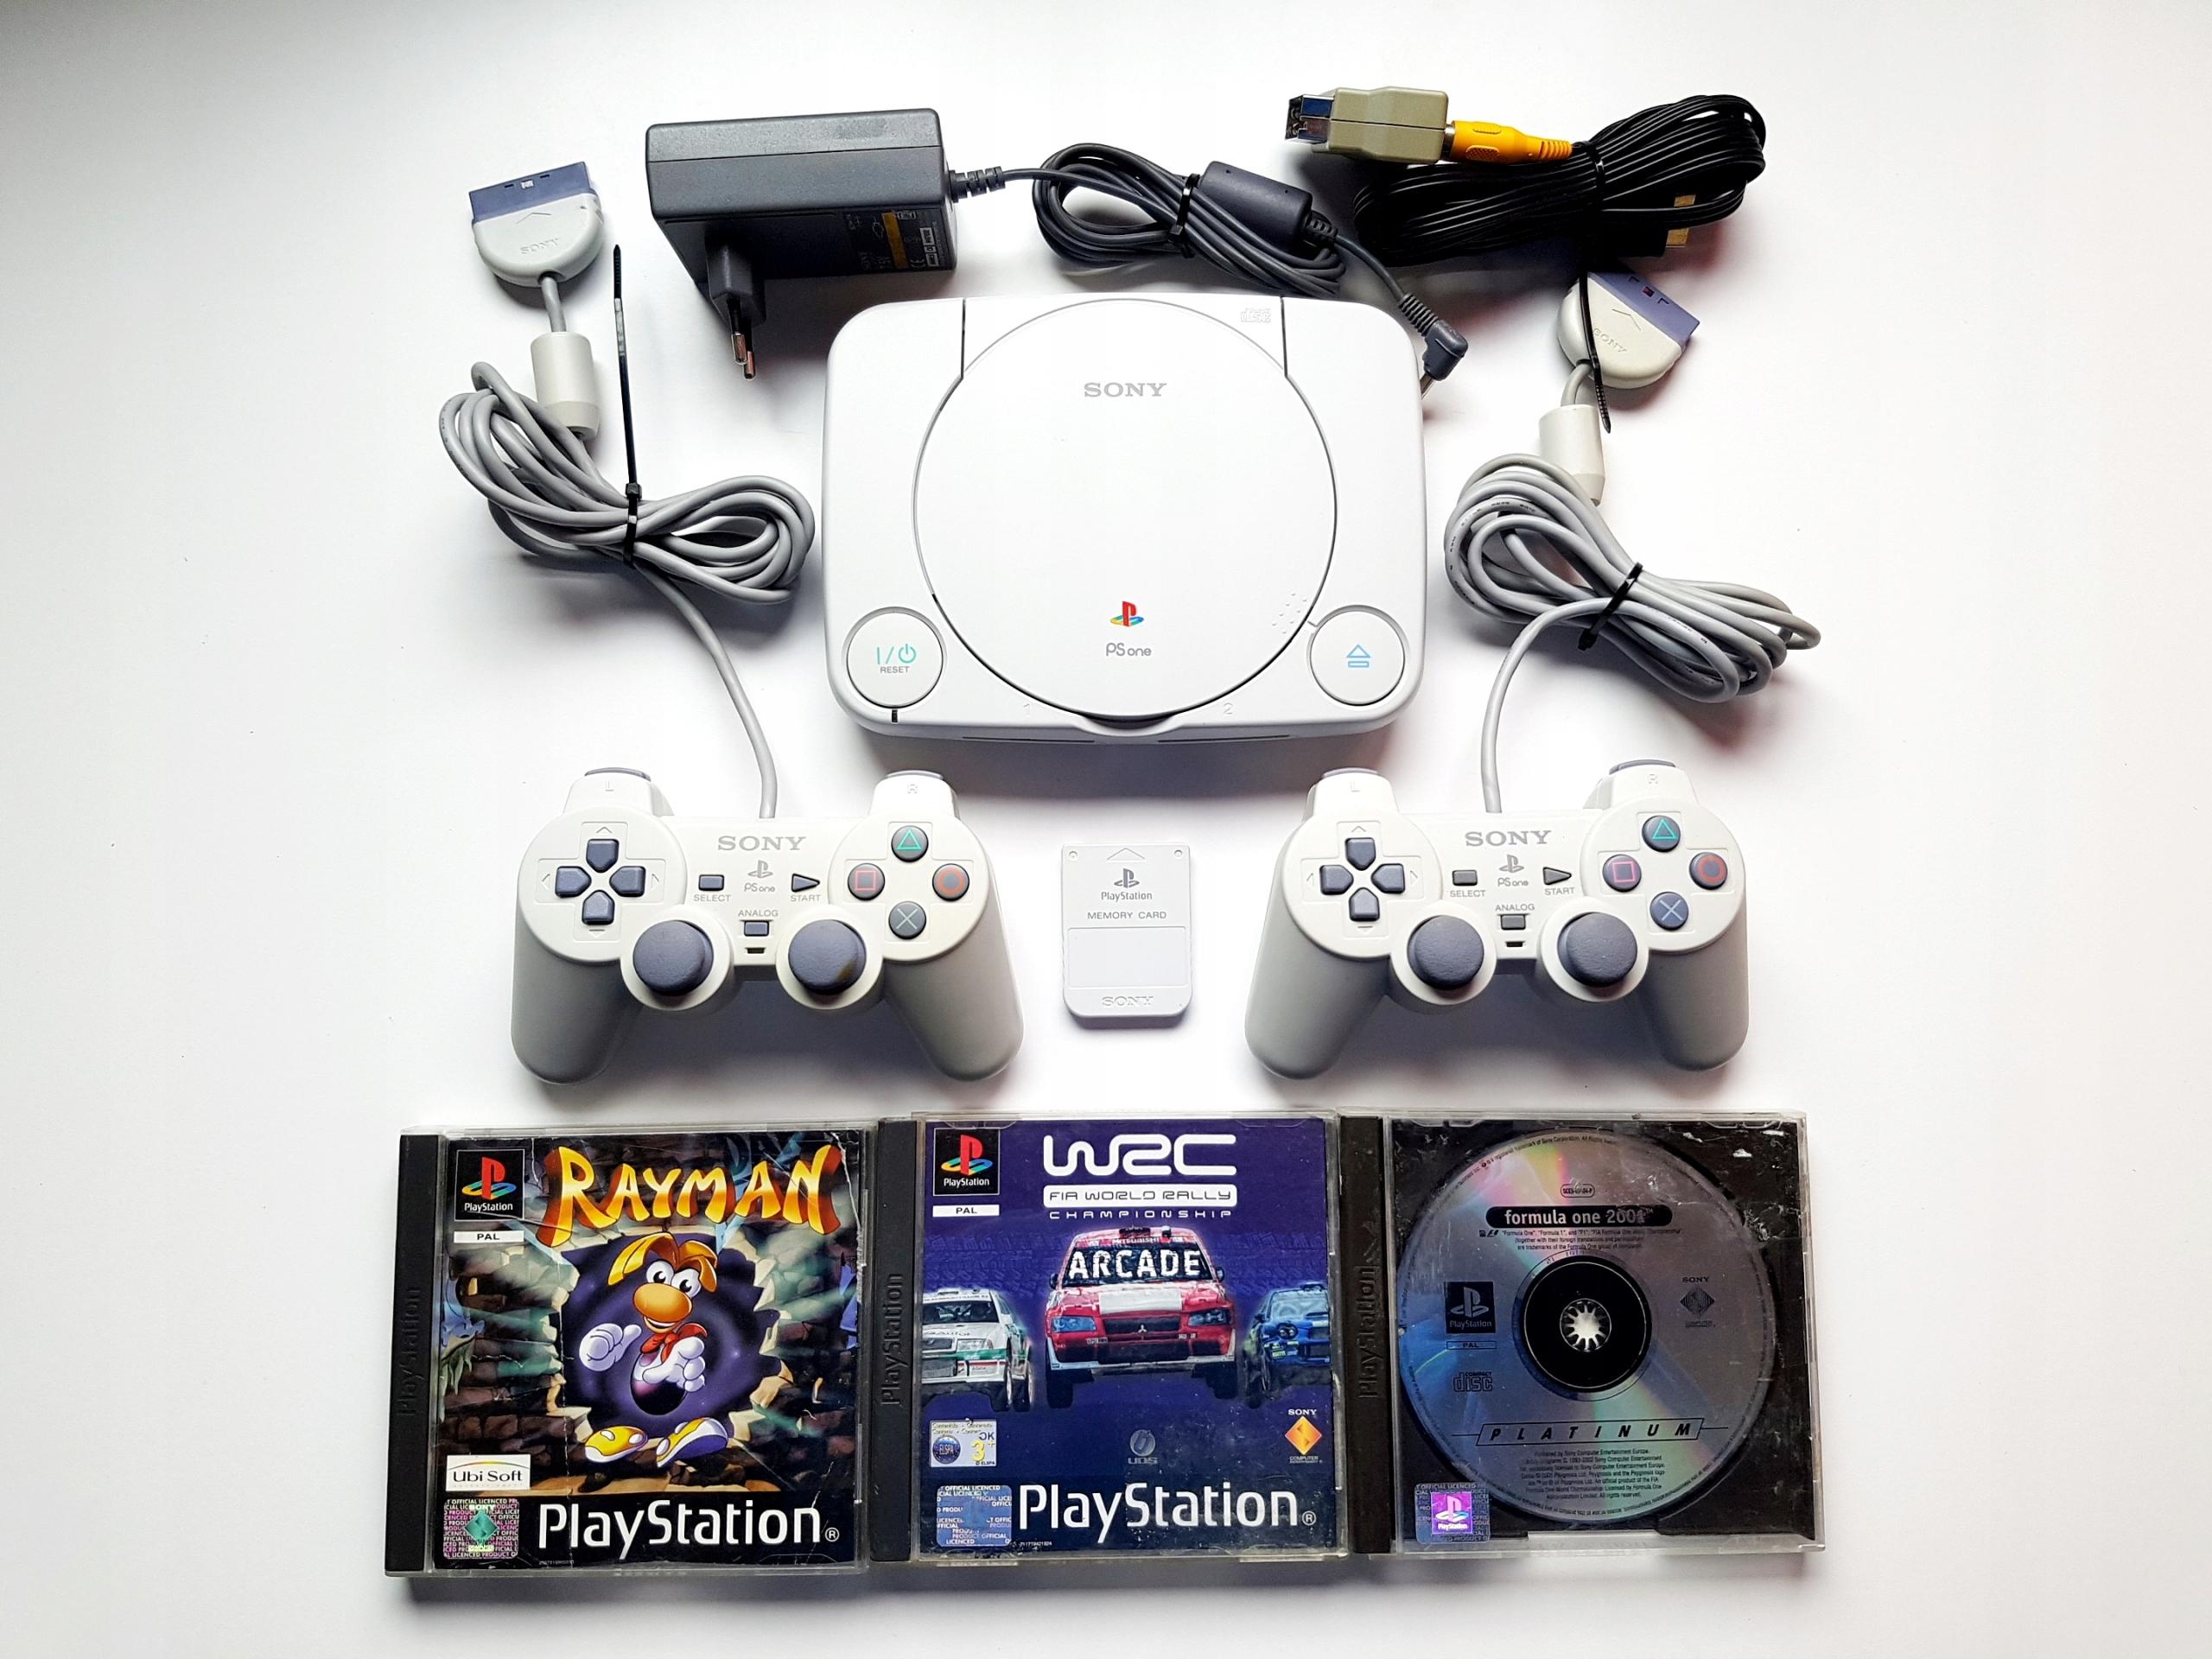 Playstation 1 PSOne PSX PS1 SCPH-102 GRY GWARANCJA